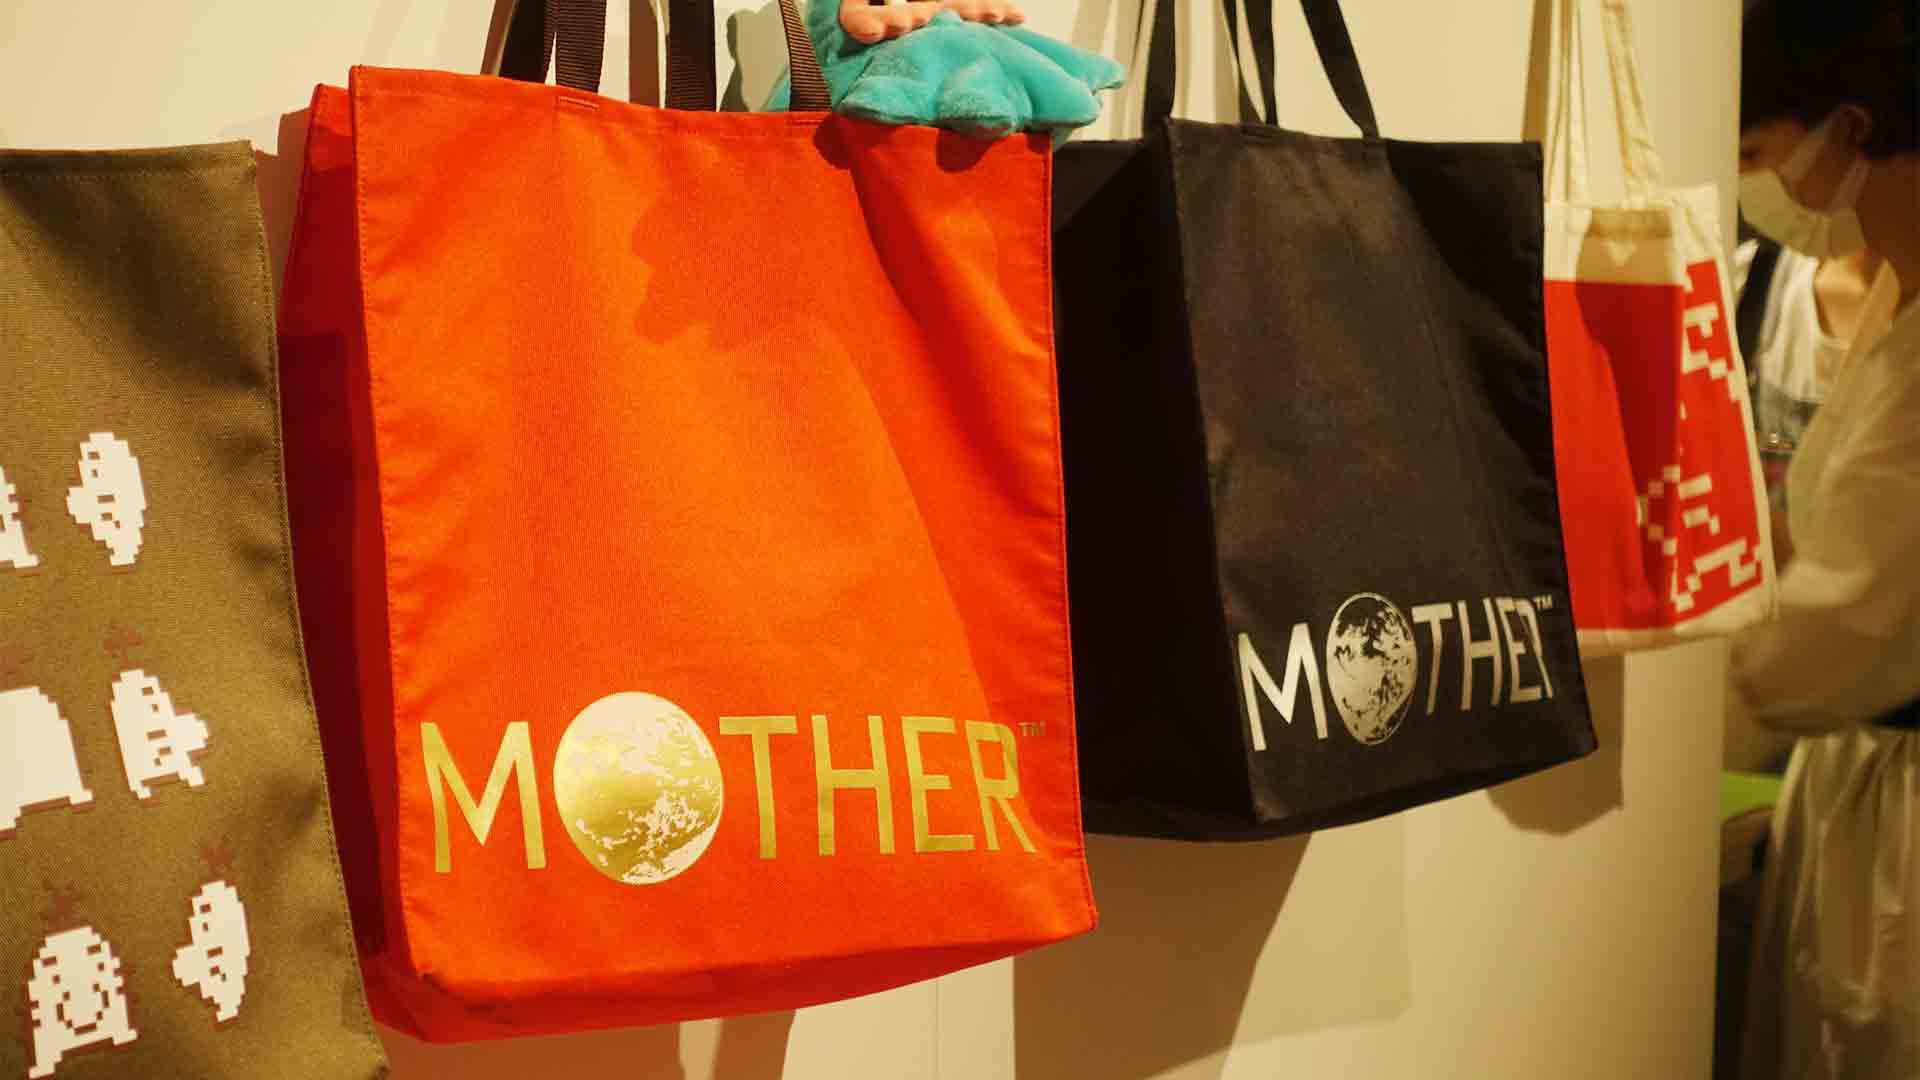 MOTHER2,MOTHERのひろば,ほぼ日,渋谷パルコ,イベント,レトロゲーム,エコバッグ